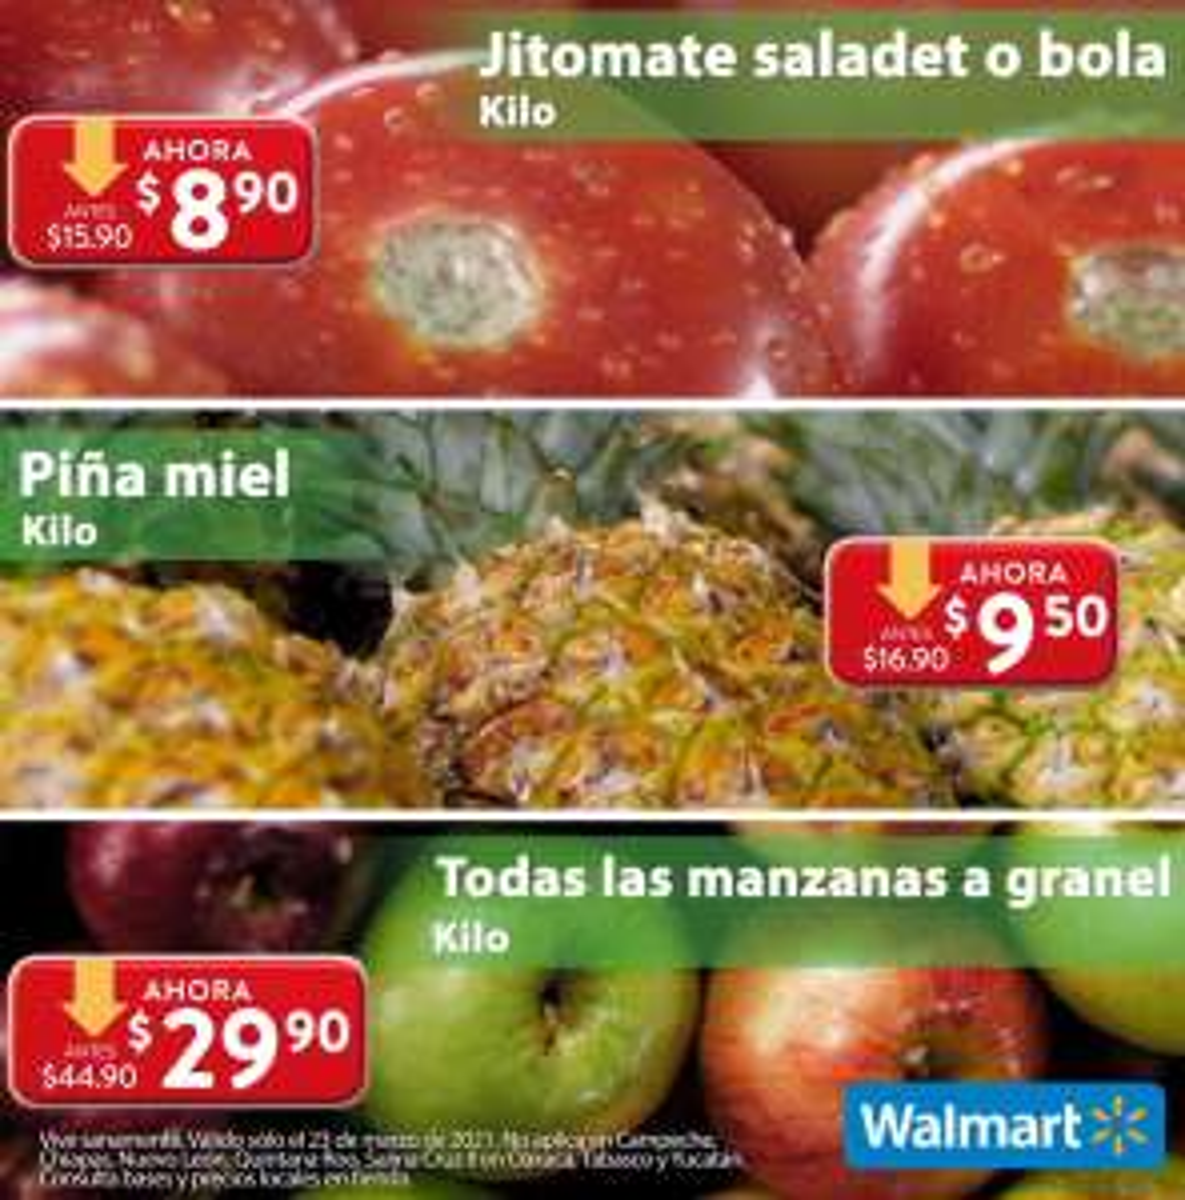 Walmart: Martes de Frescura 23 Marzo: Jitomate Saladet ó Bola $8.90 kg... Piña $9.50 kg... Todas las Manzanas $29.90 kg.